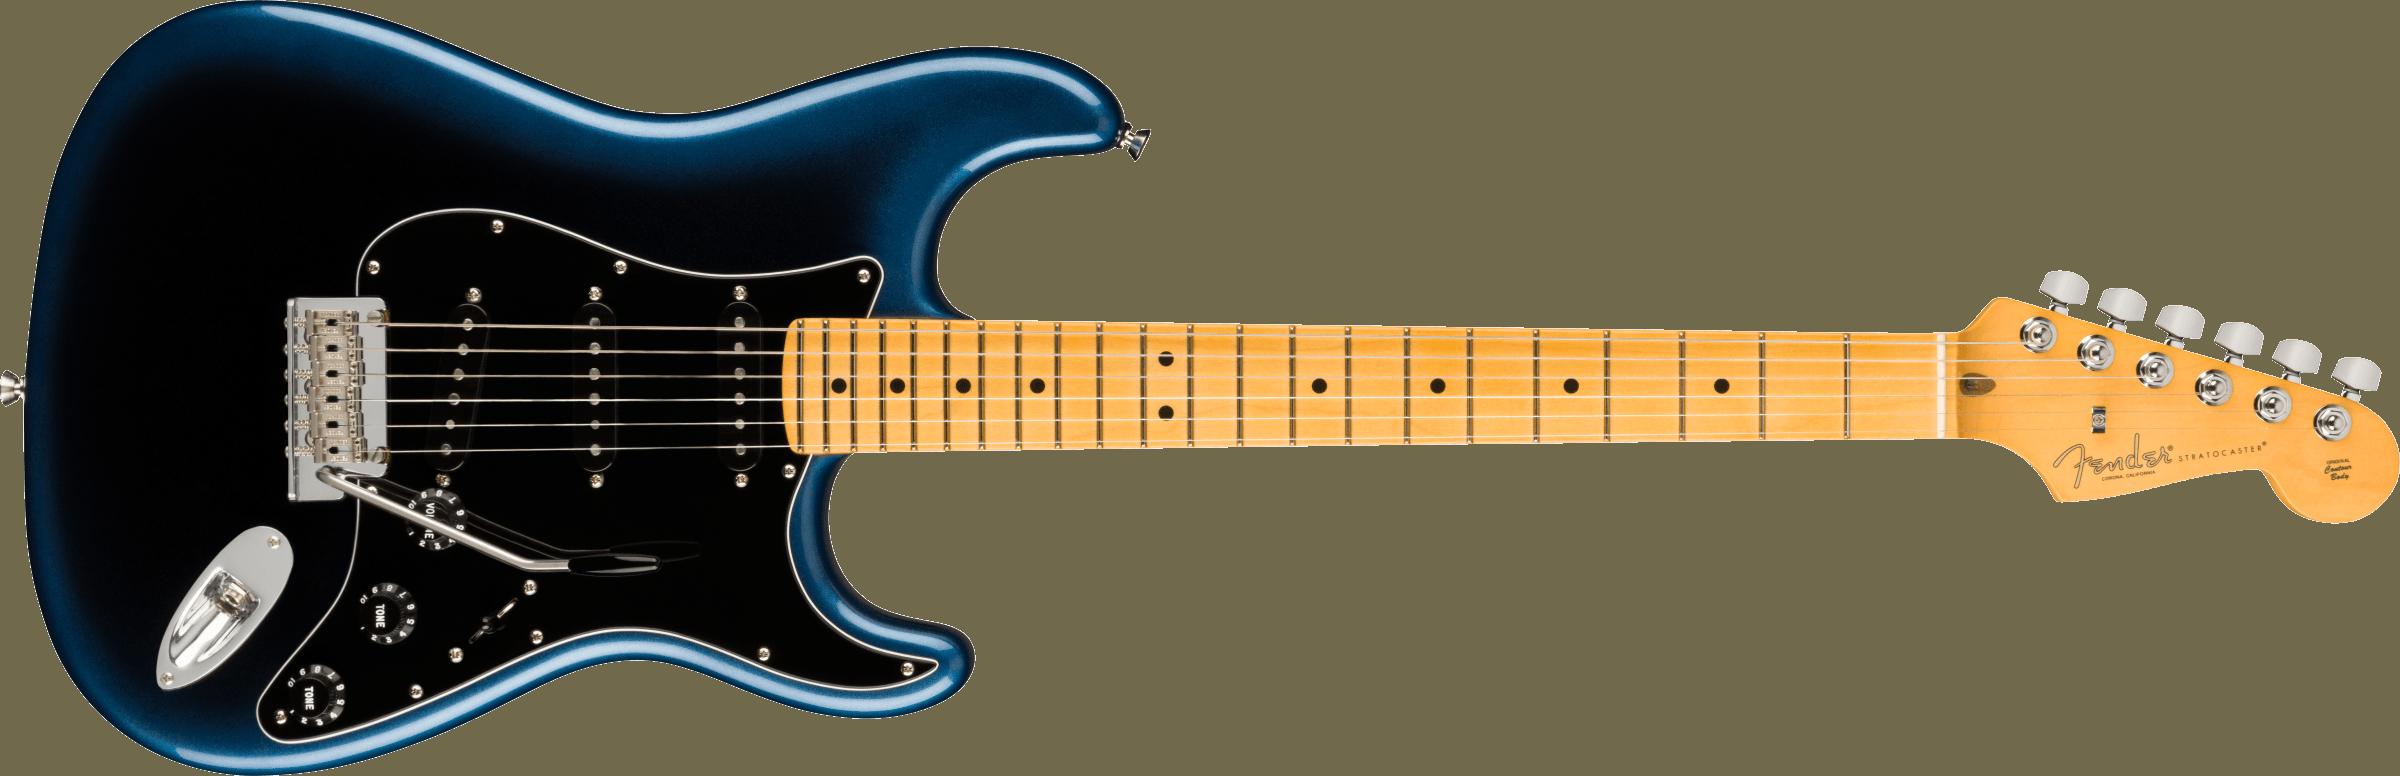 Fender American Professional II Stratocaster®, Maple Fingerboard, Dark Night